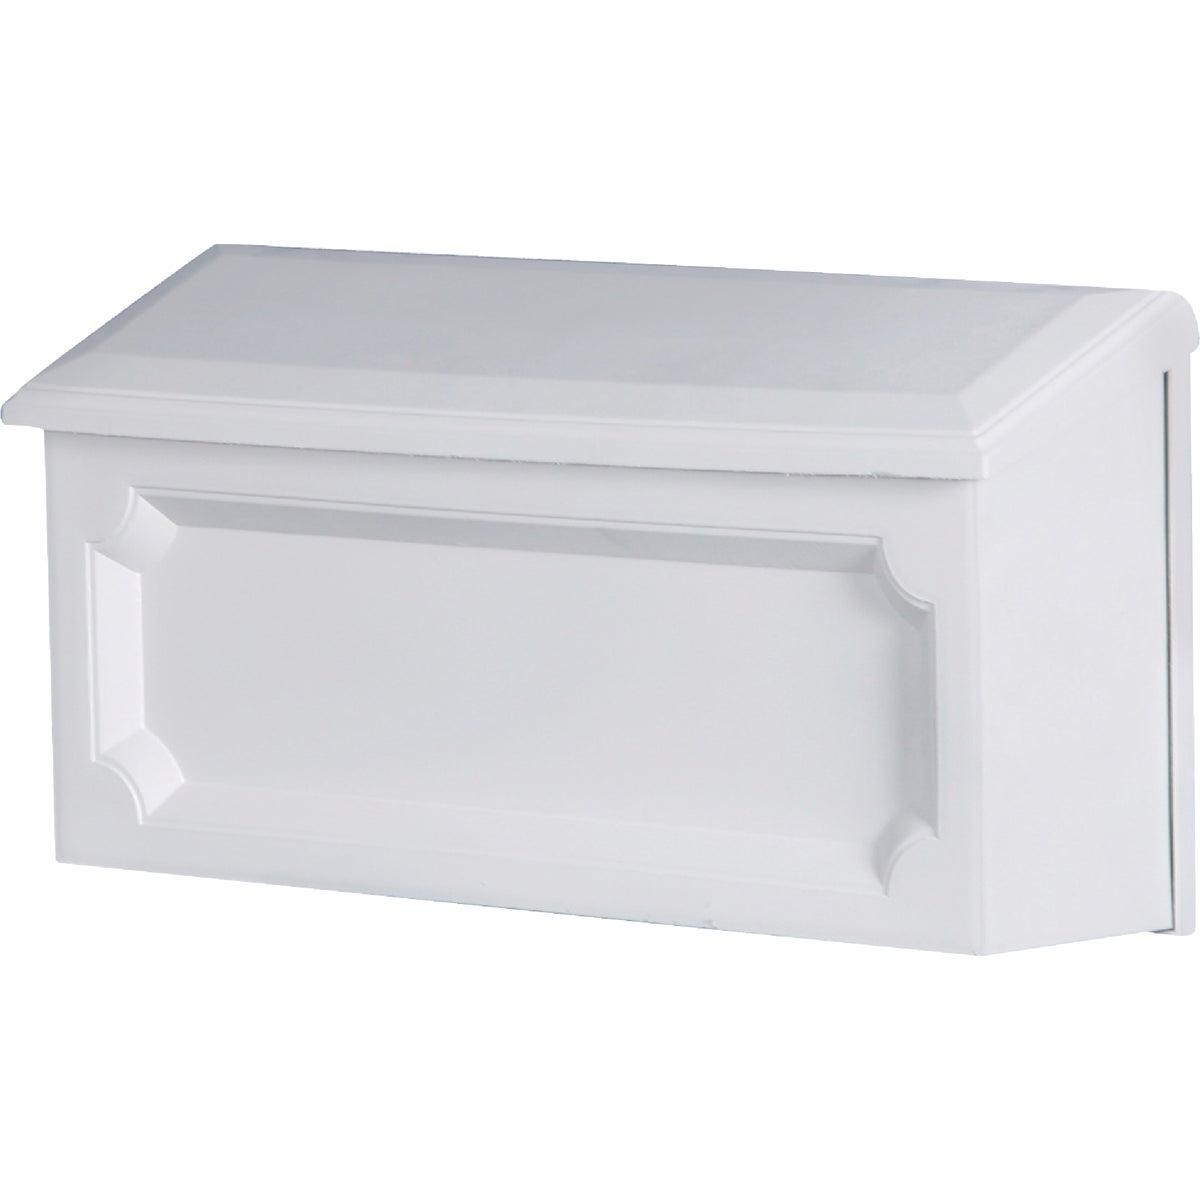 Wht Horzntl Poly Mailbox